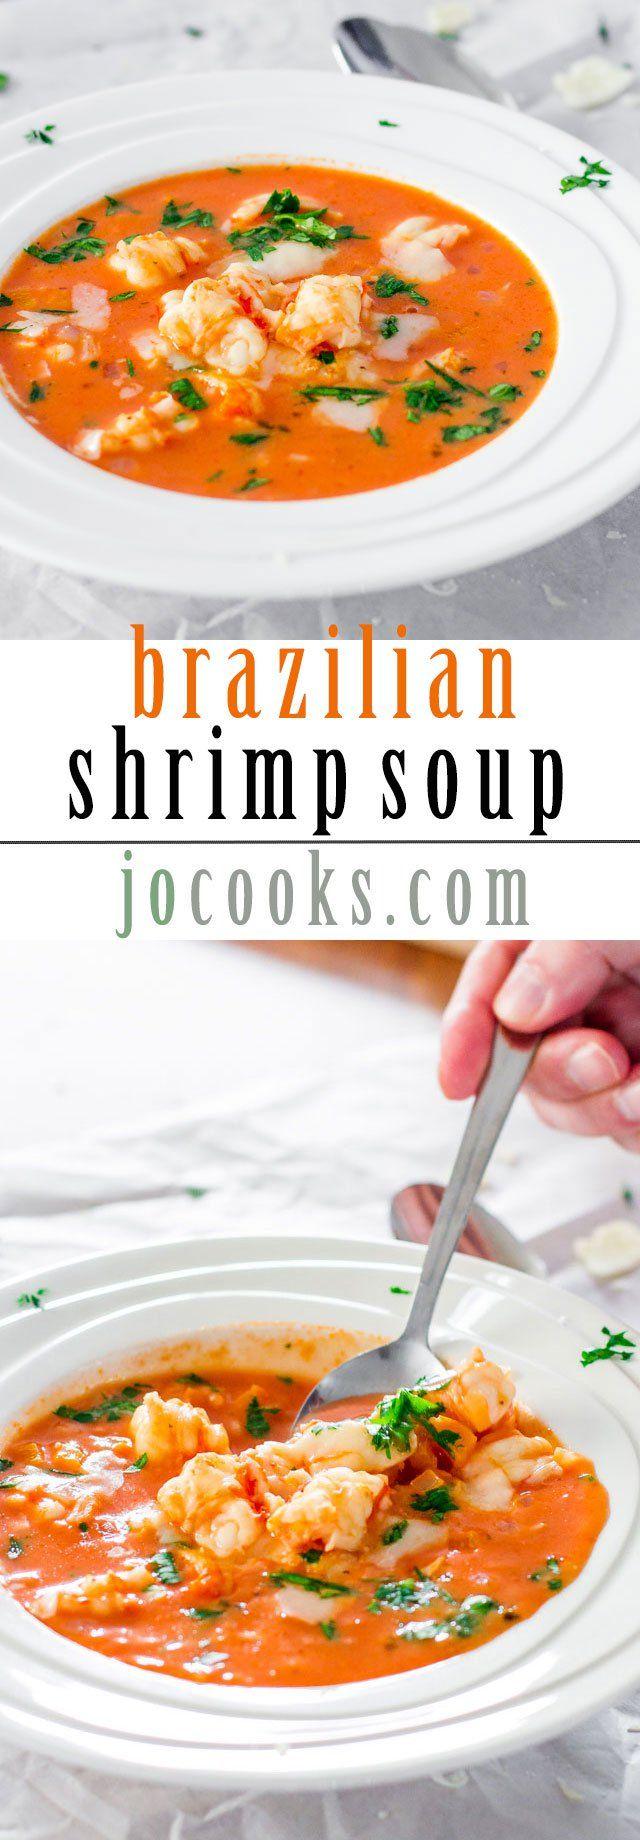 Brazilian Shrimp Soup - a delicious tomato creamy soup with shrimp, coconut milk and seasoned to perfection.